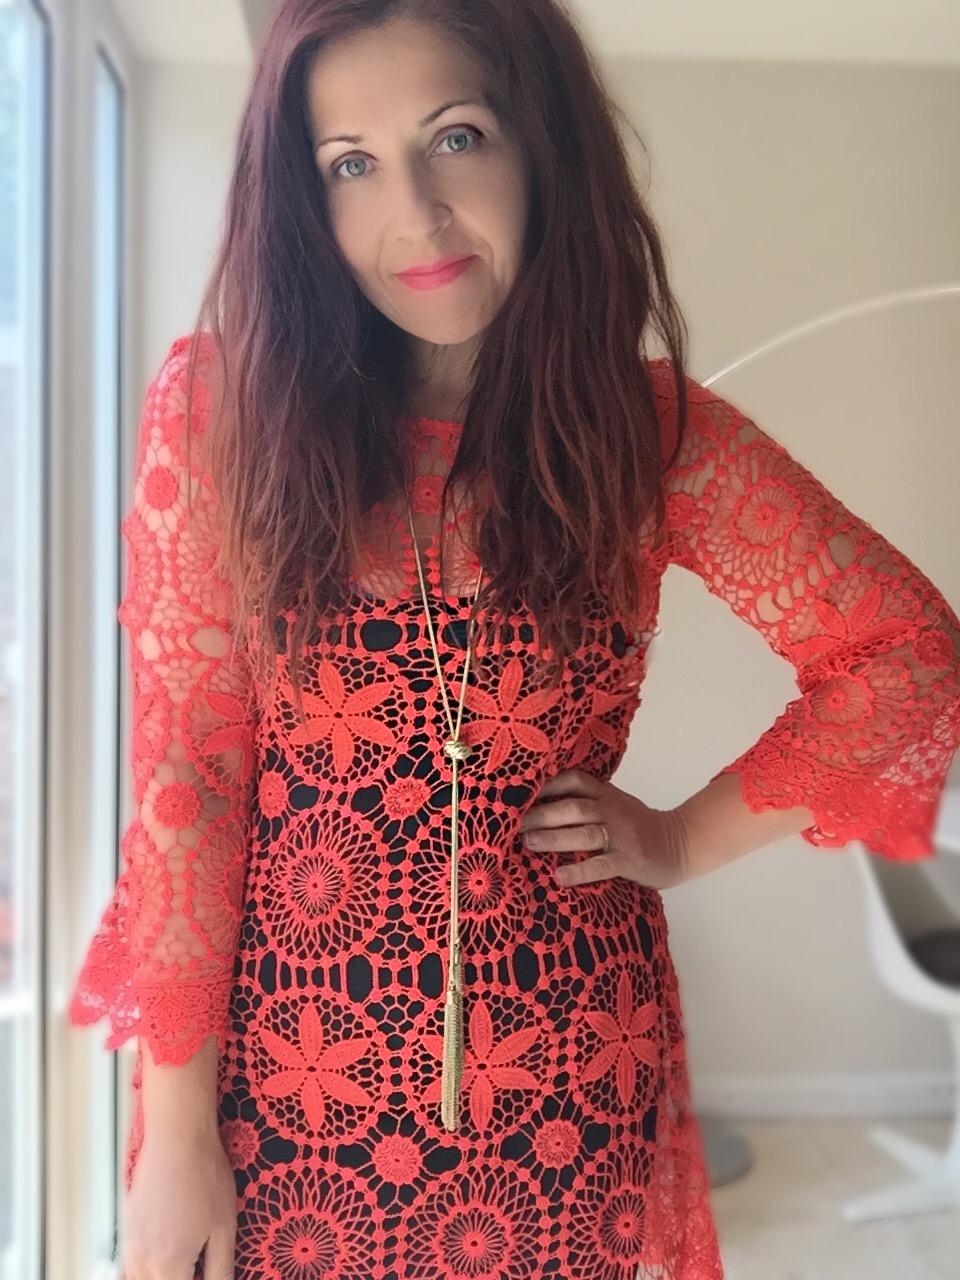 HandM loves Coachella lace dress via Always a blue Sky girl fashion blog